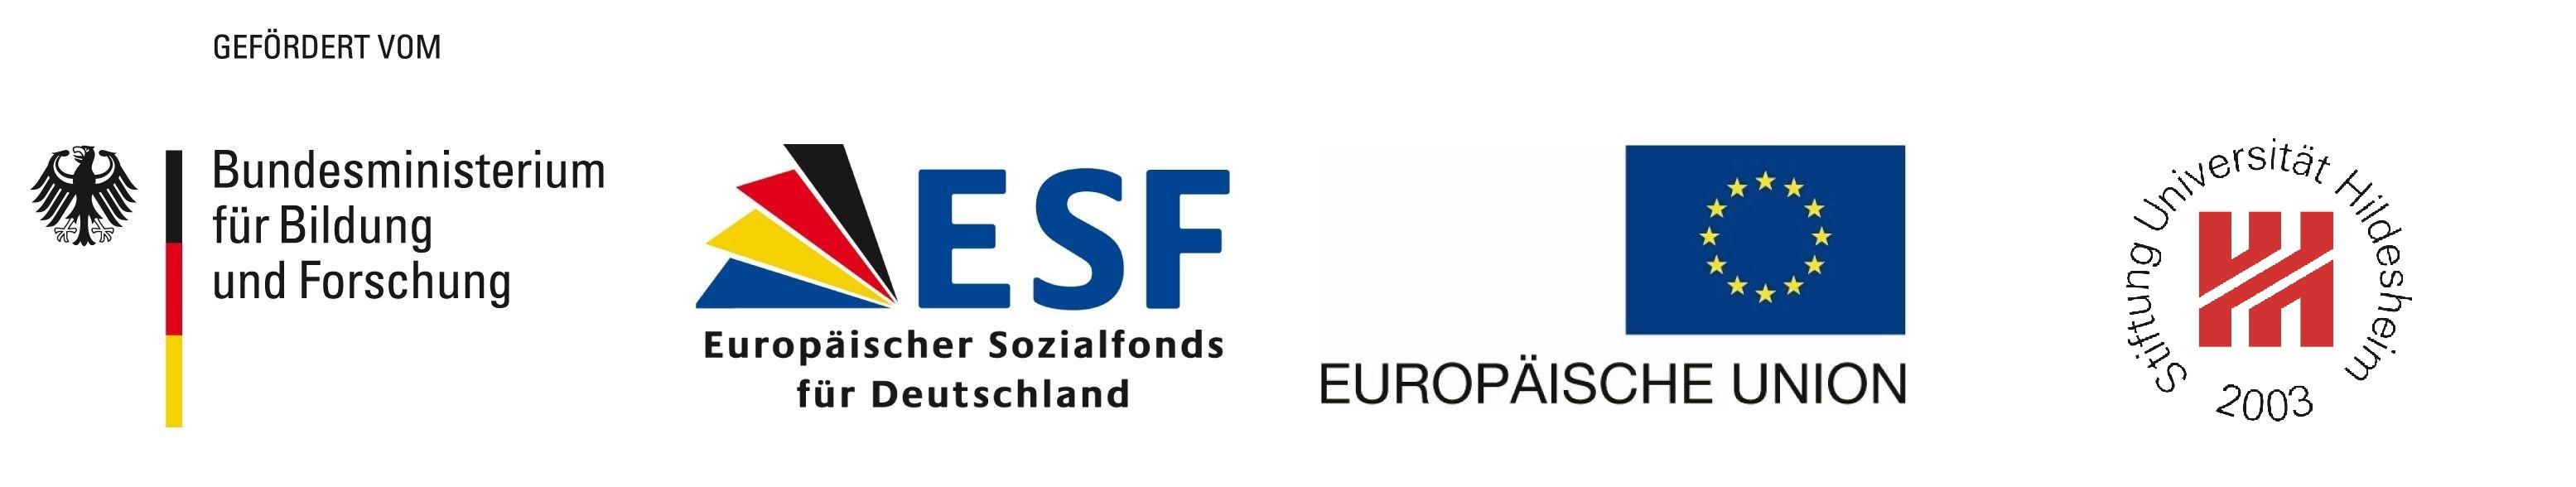 Logoleiste_BMBF-ESF-EU-UniHi